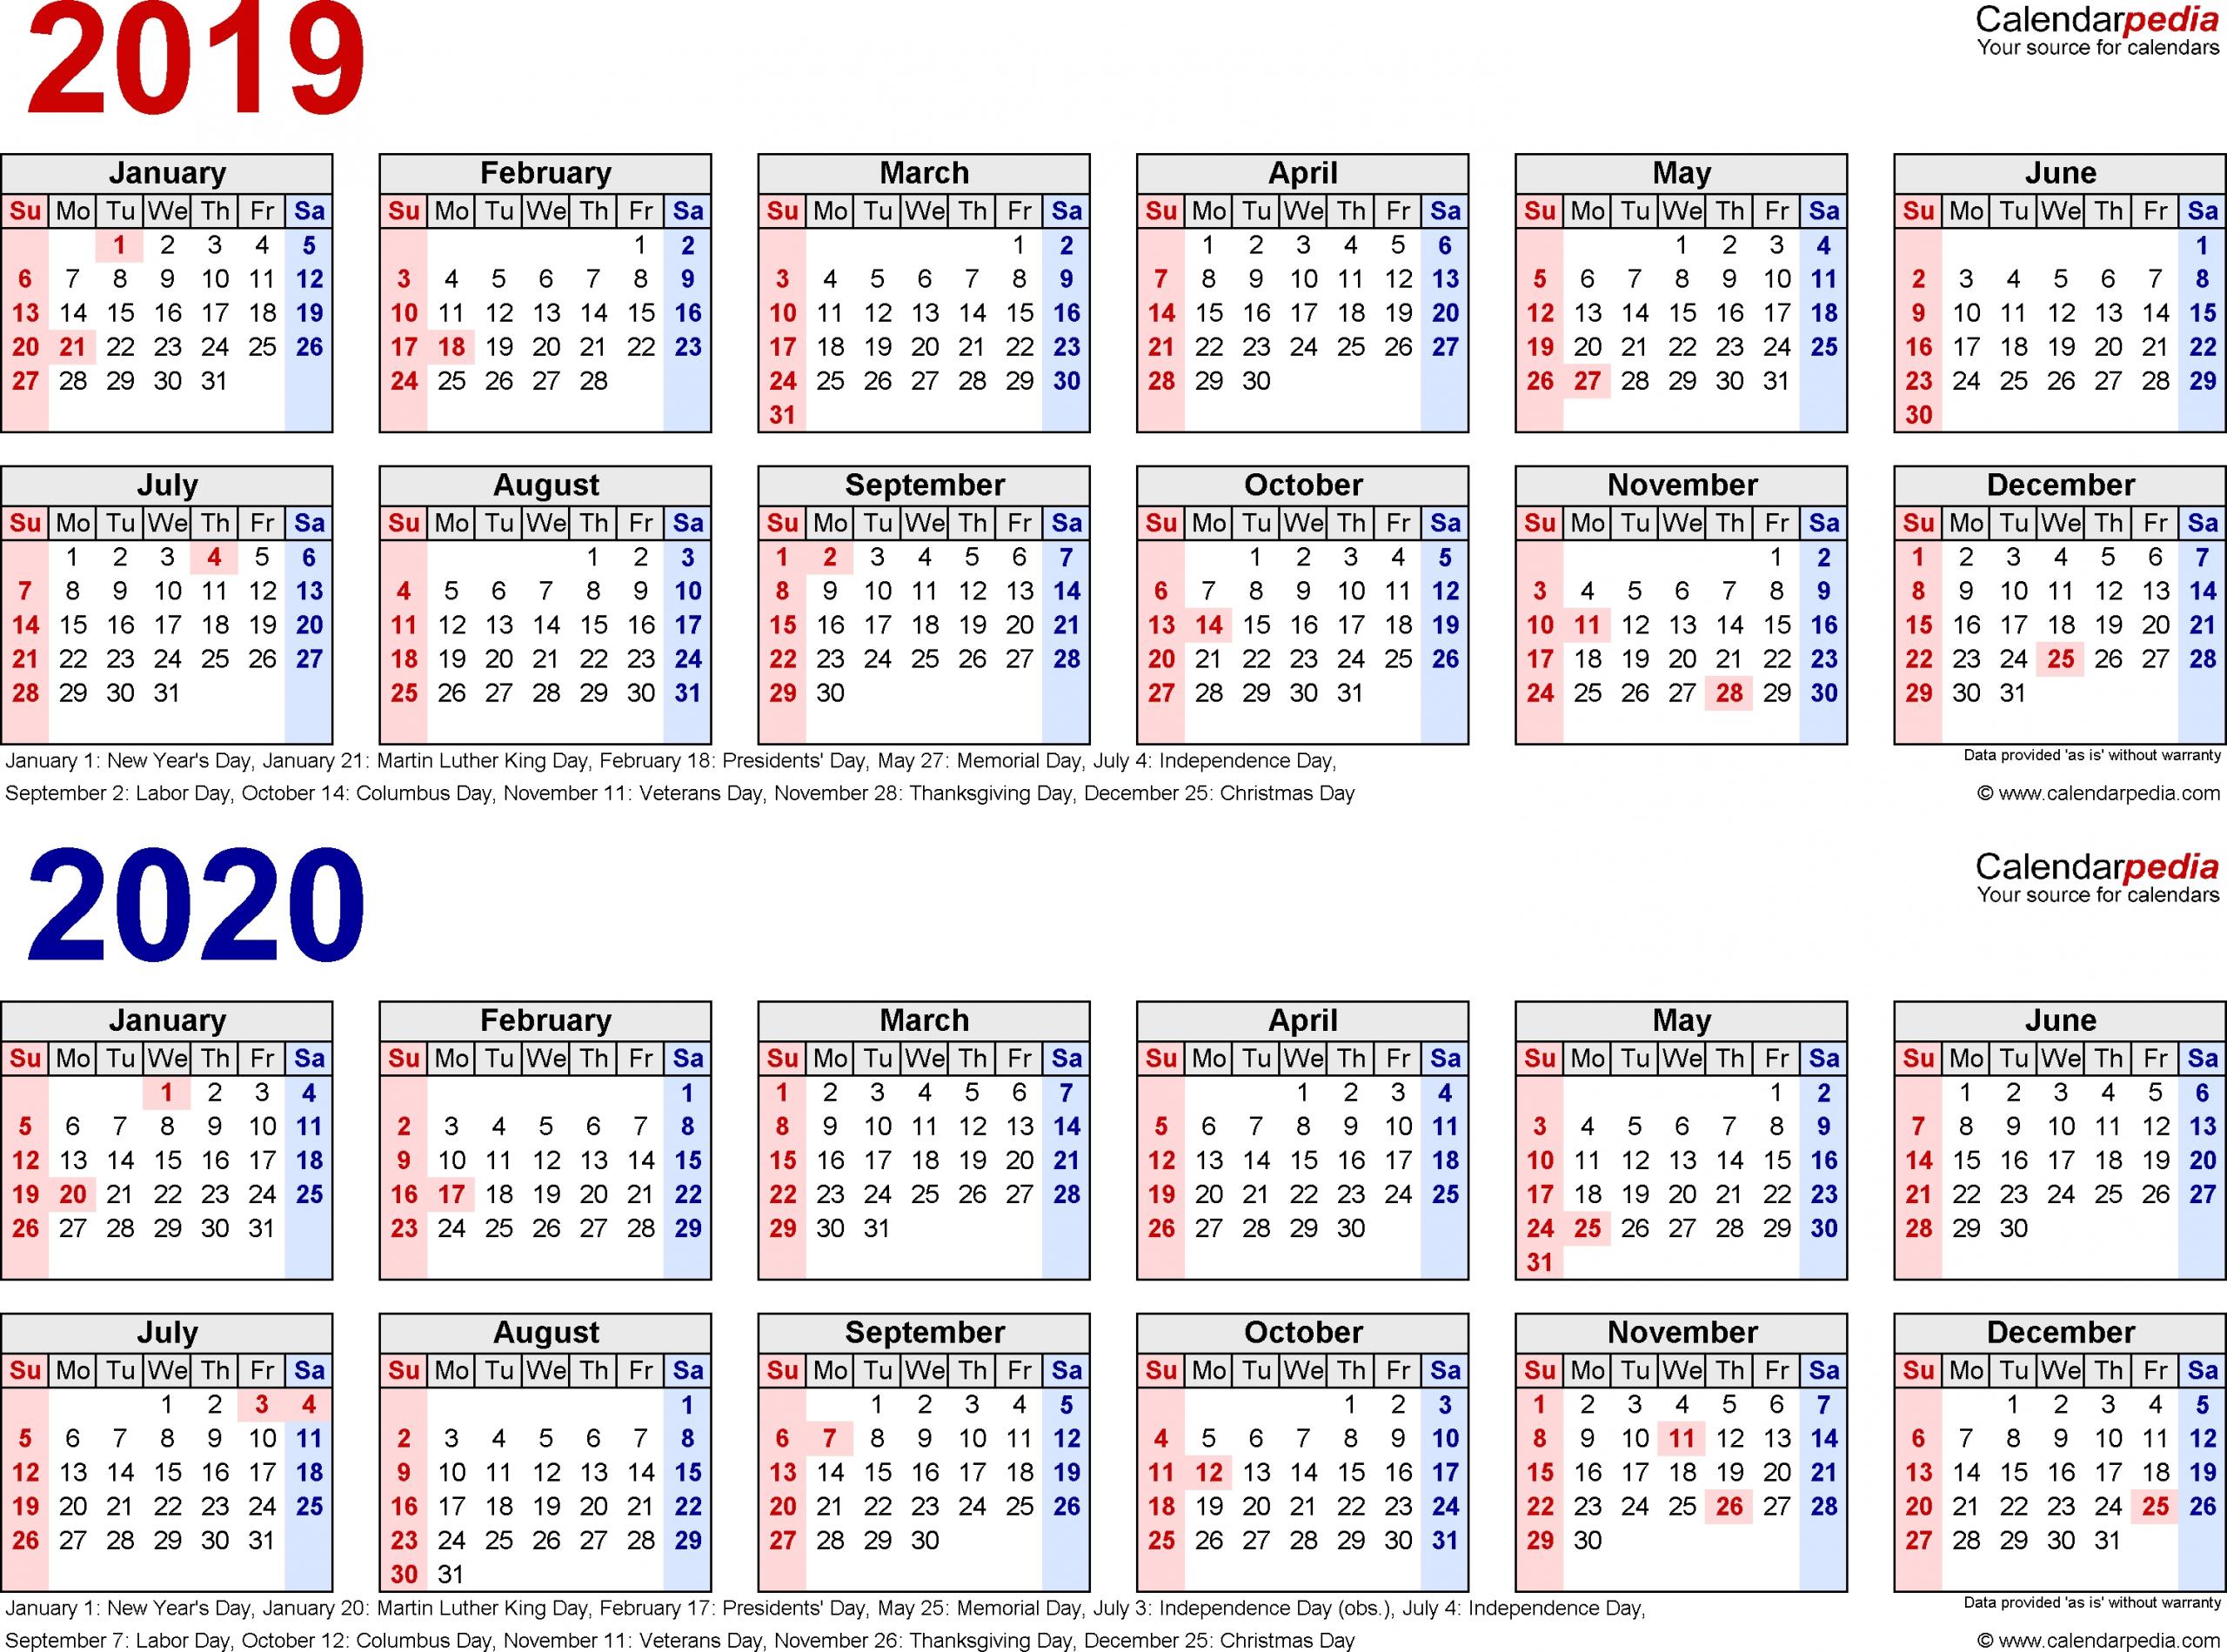 Printable Yearly Calendar June 2019-2020 - Calendar Multiple Year Printable Calendar